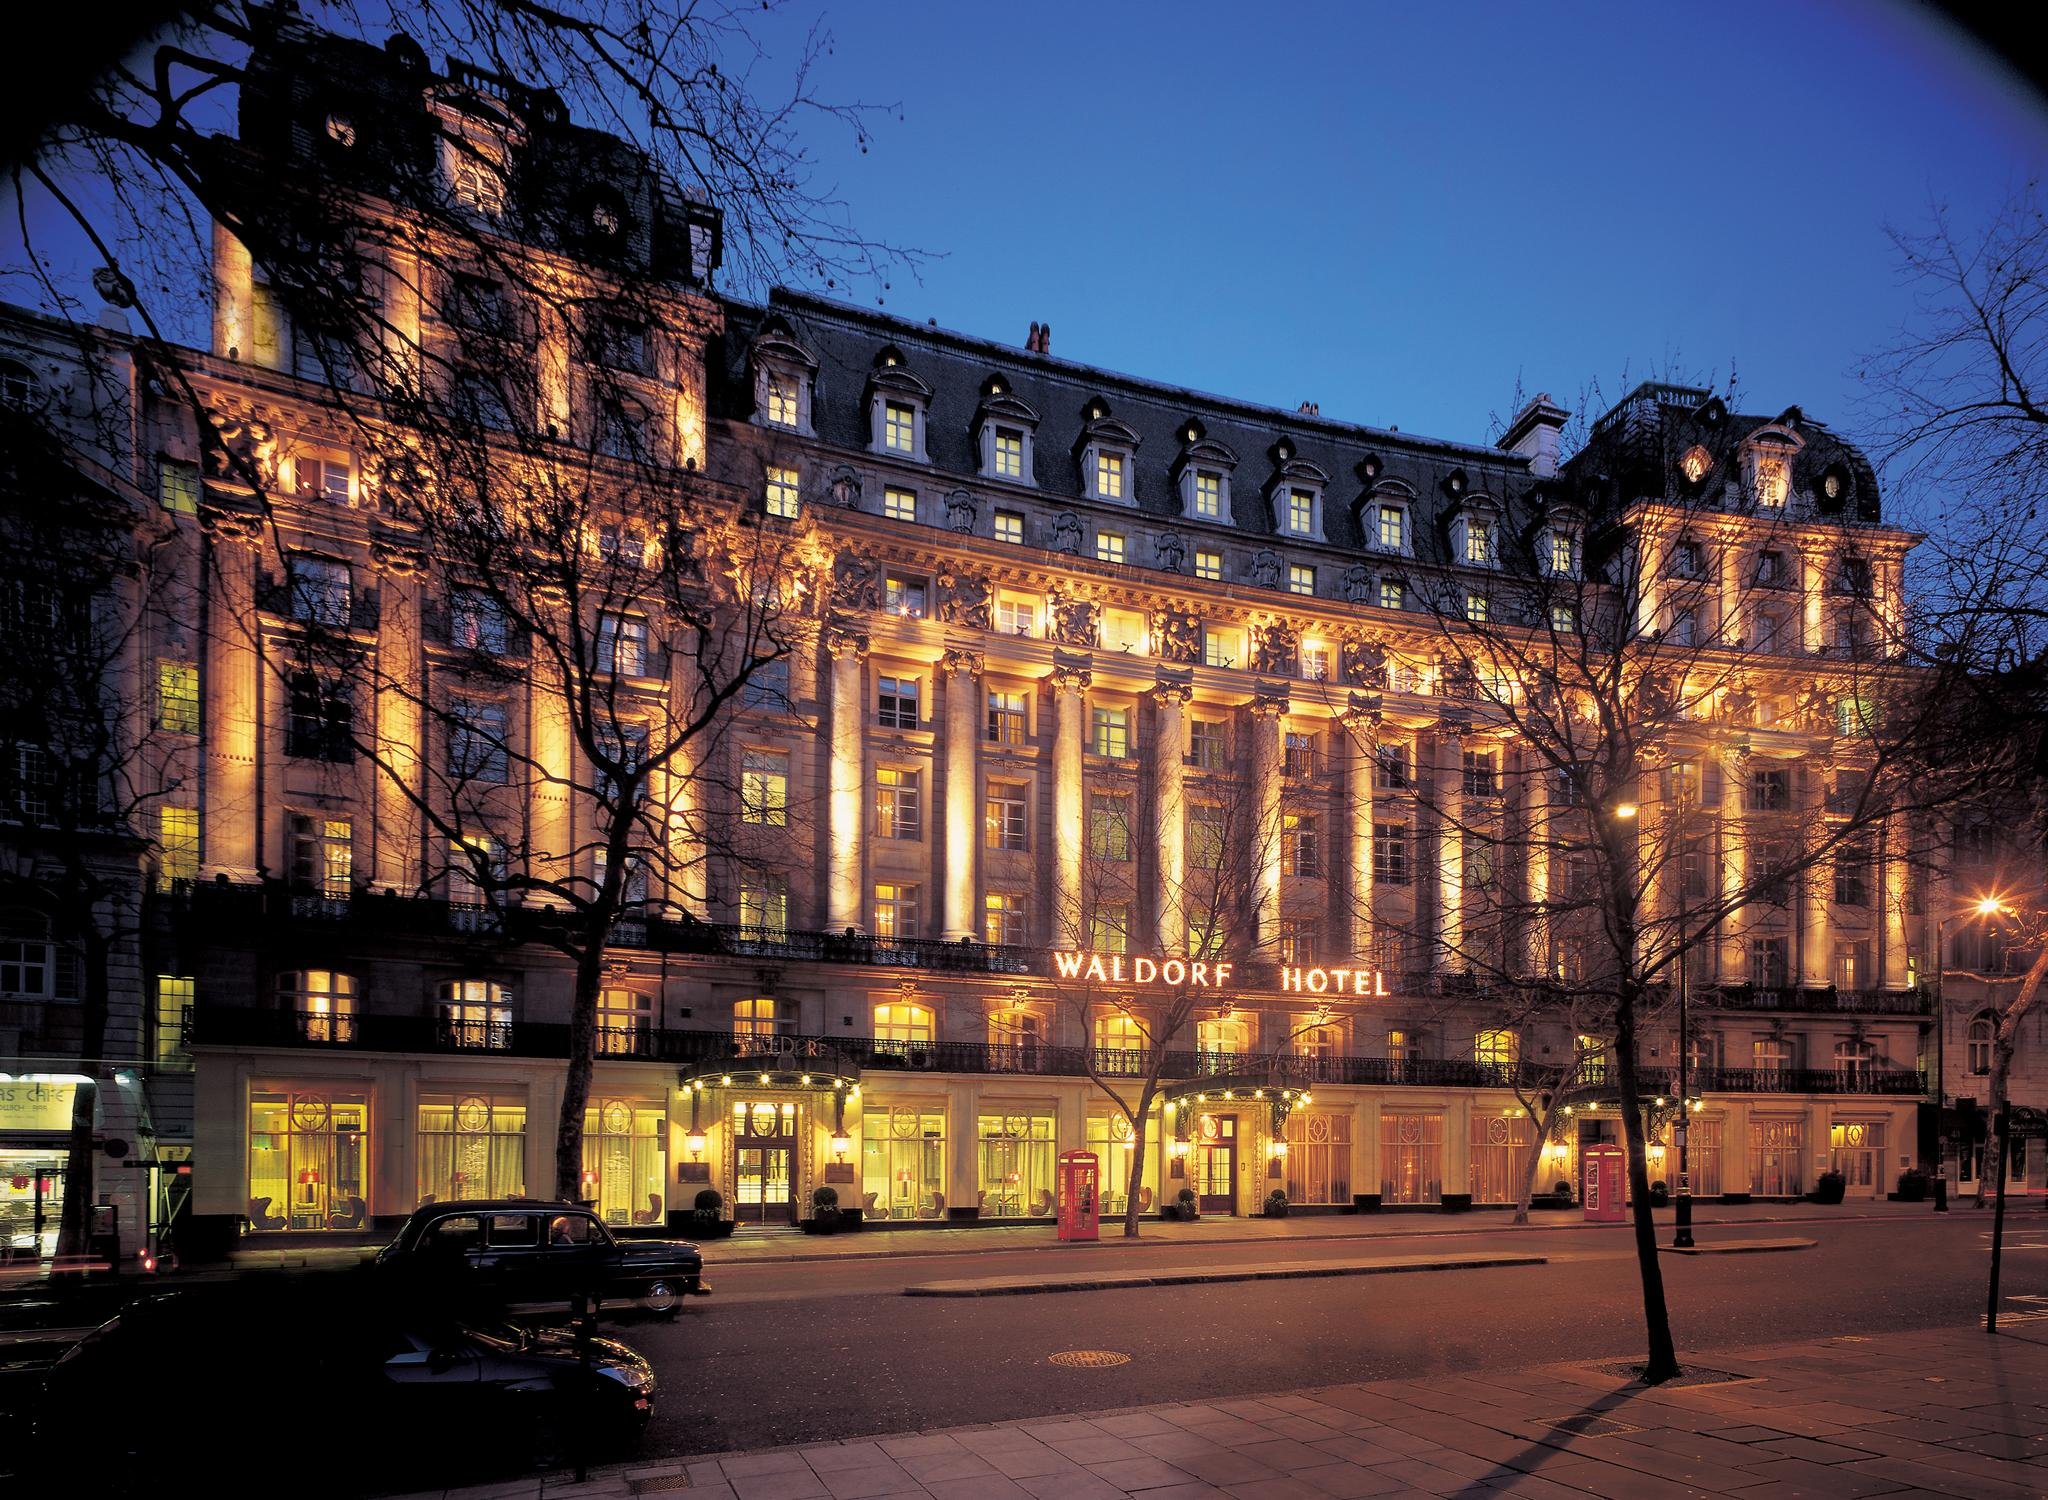 Hilton worldwide hotels resorts regno unito for Hotels 02 london